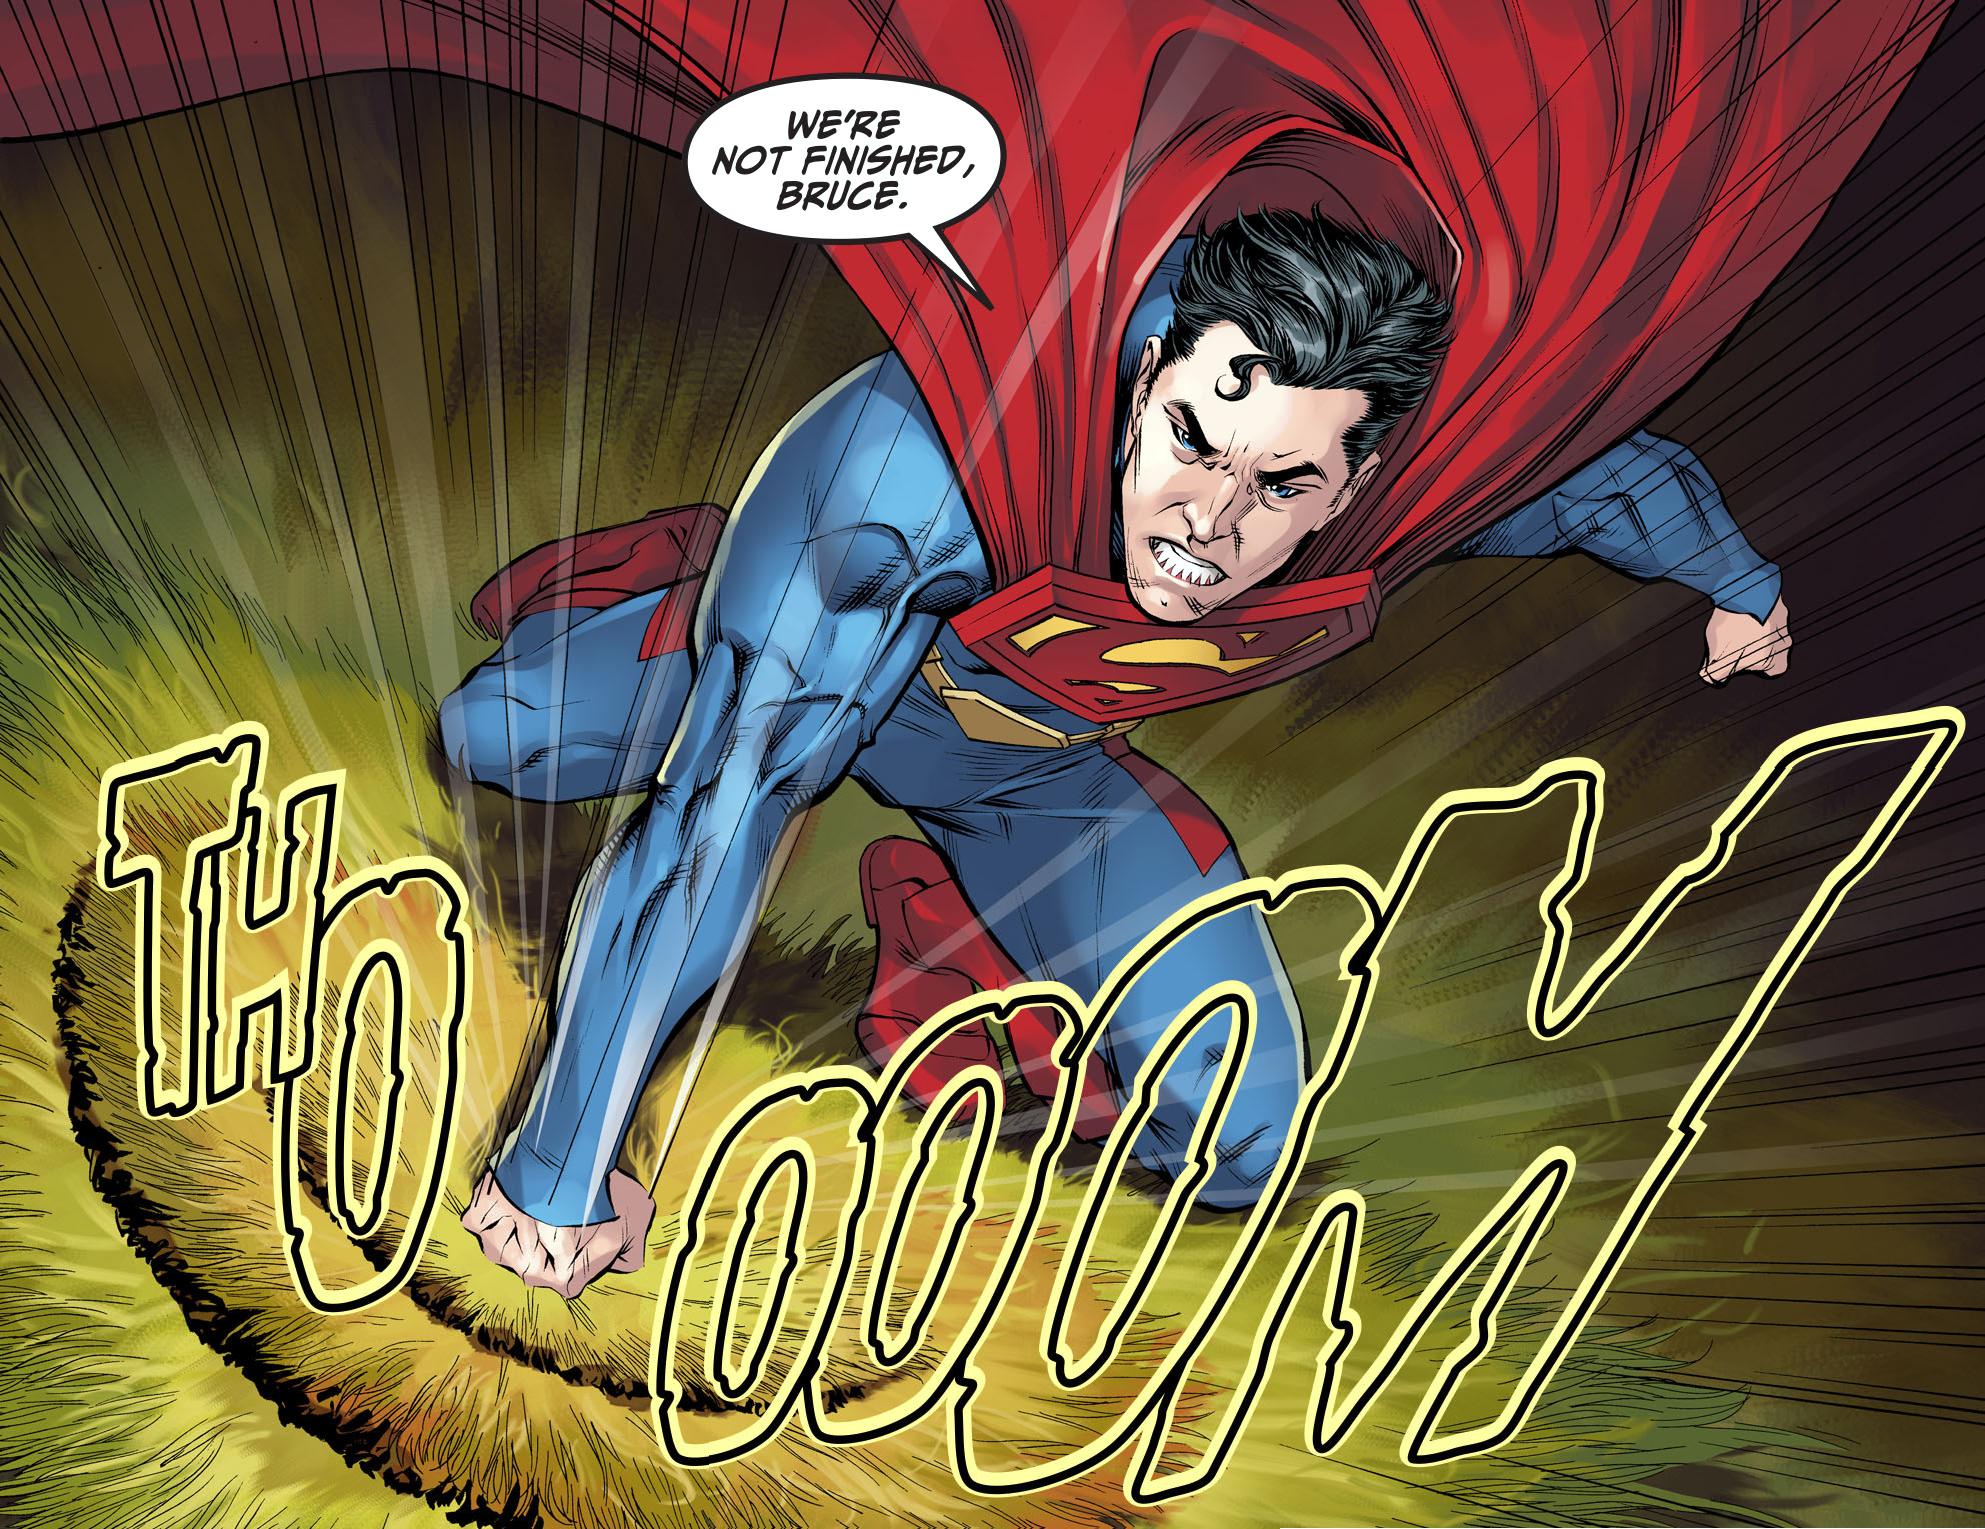 superman vs batman (injustice gods among us)